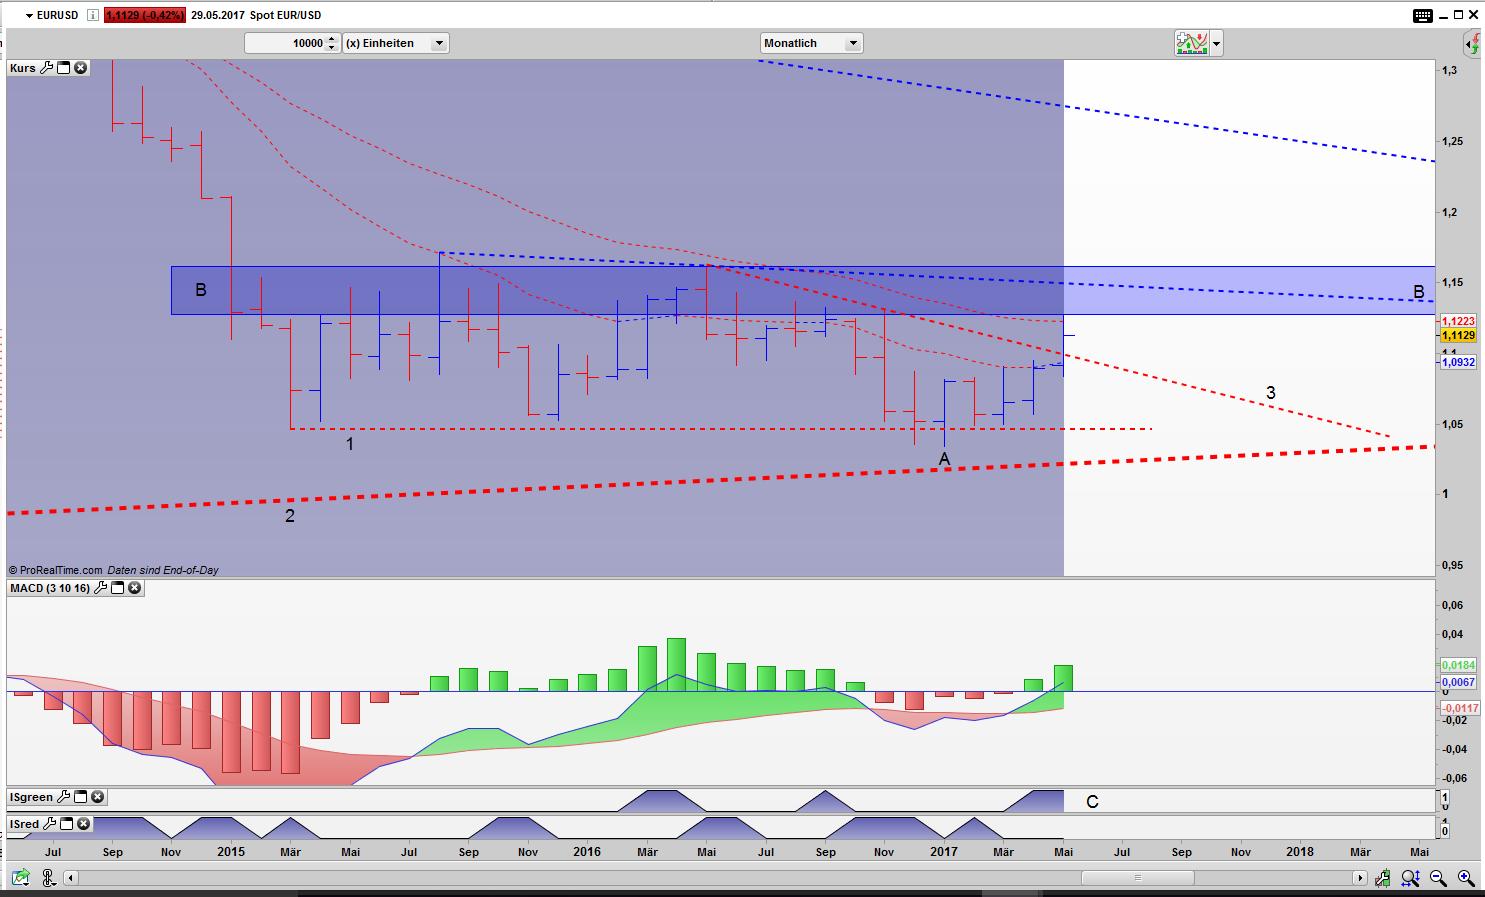 EUR/USD im Monats Bar Chart